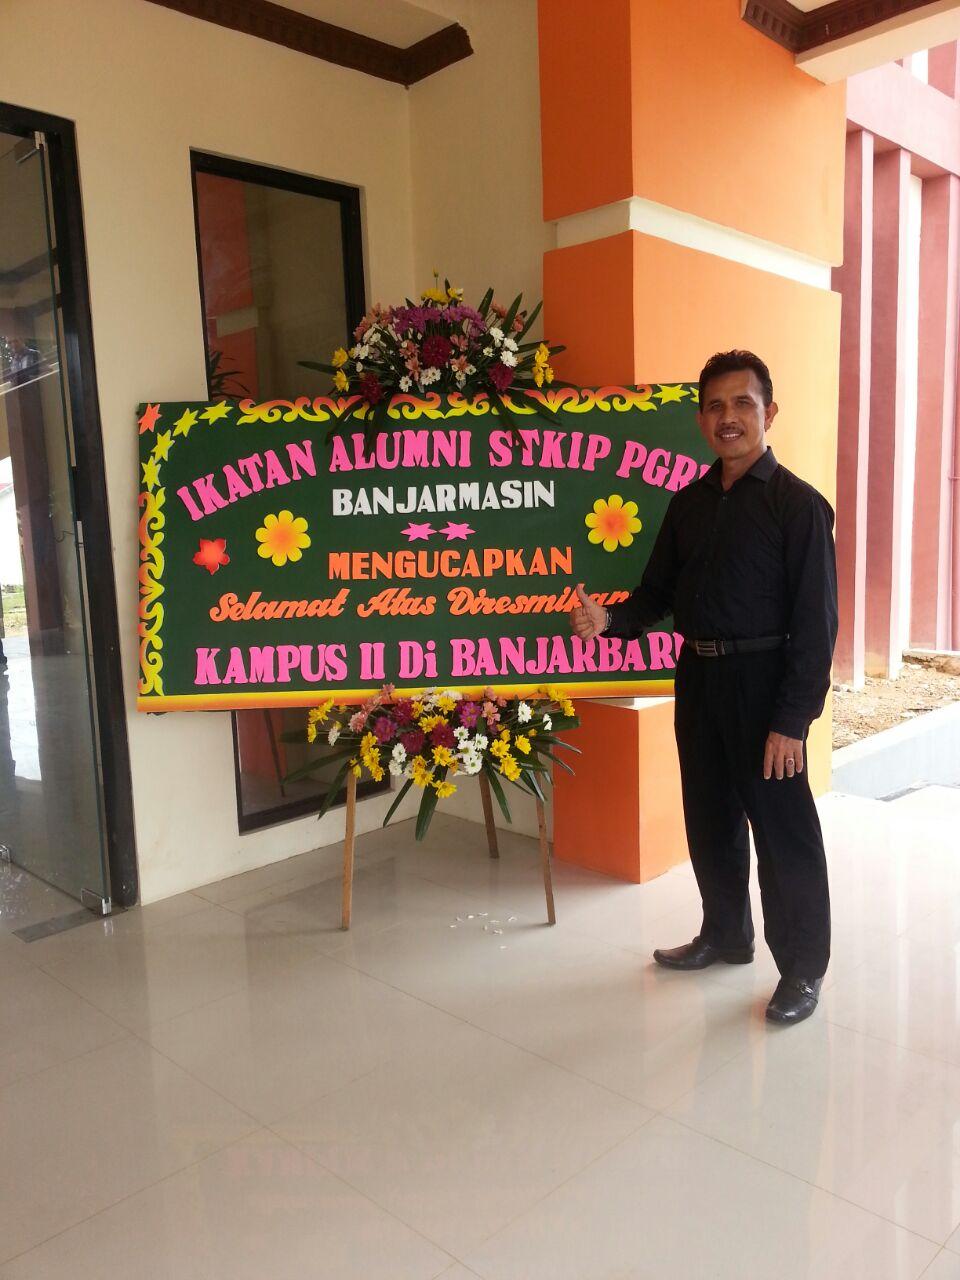 Selamatan Kampus Baru Banjarbaru